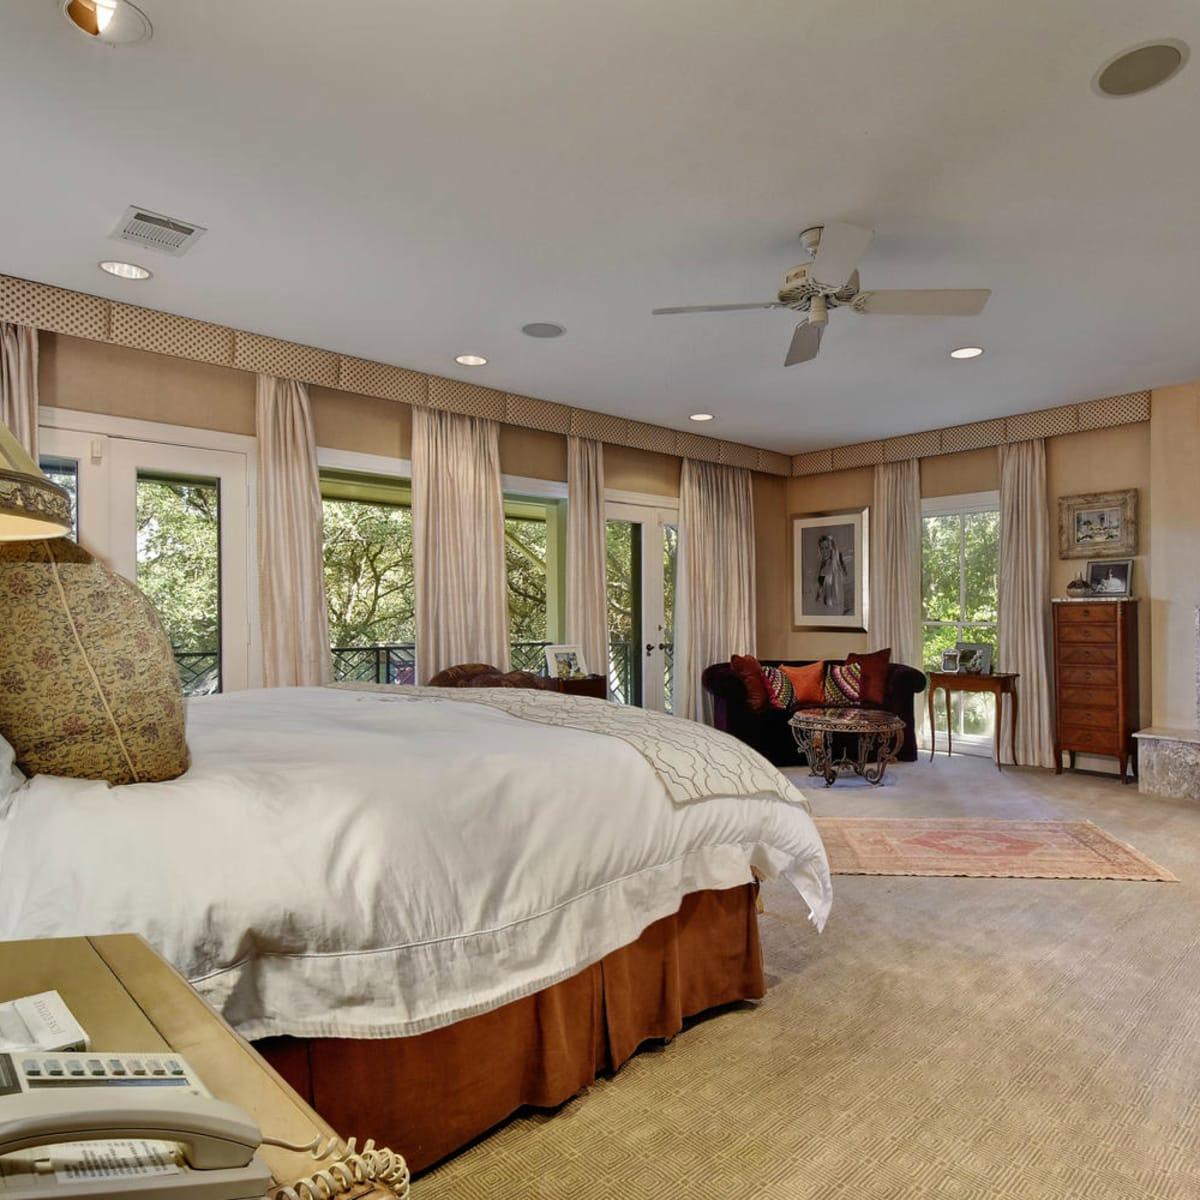 Austin house home Tarrytown 2610 Kenmore Court Ben Crenshaw February 2016 master bedroom